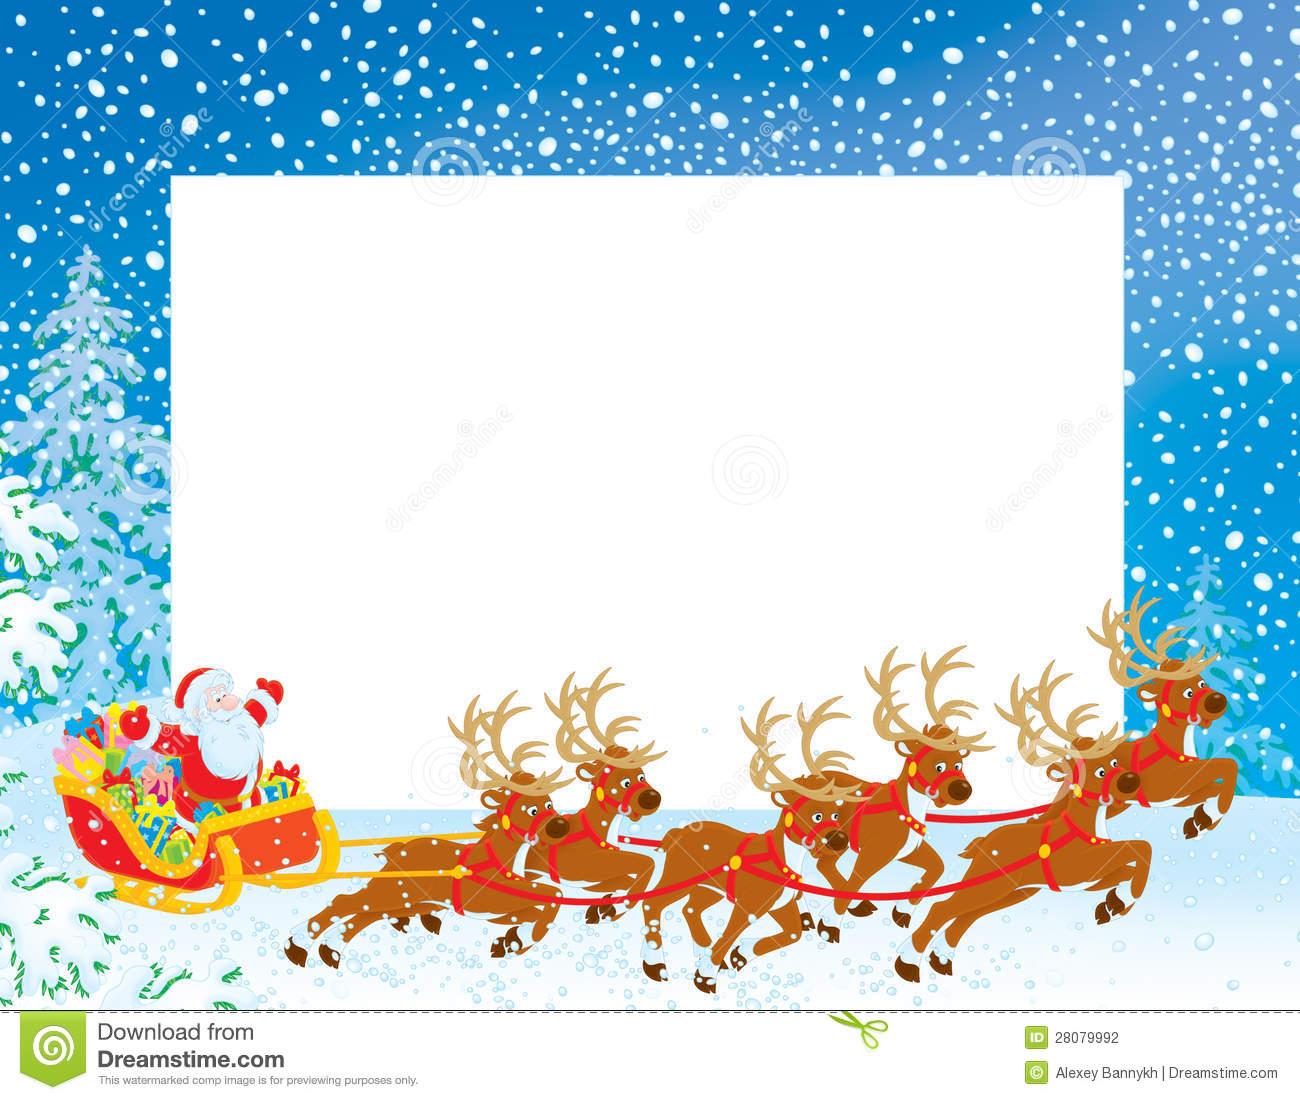 Christmas Sleigh With Santa Border With Sleigh Of Santa